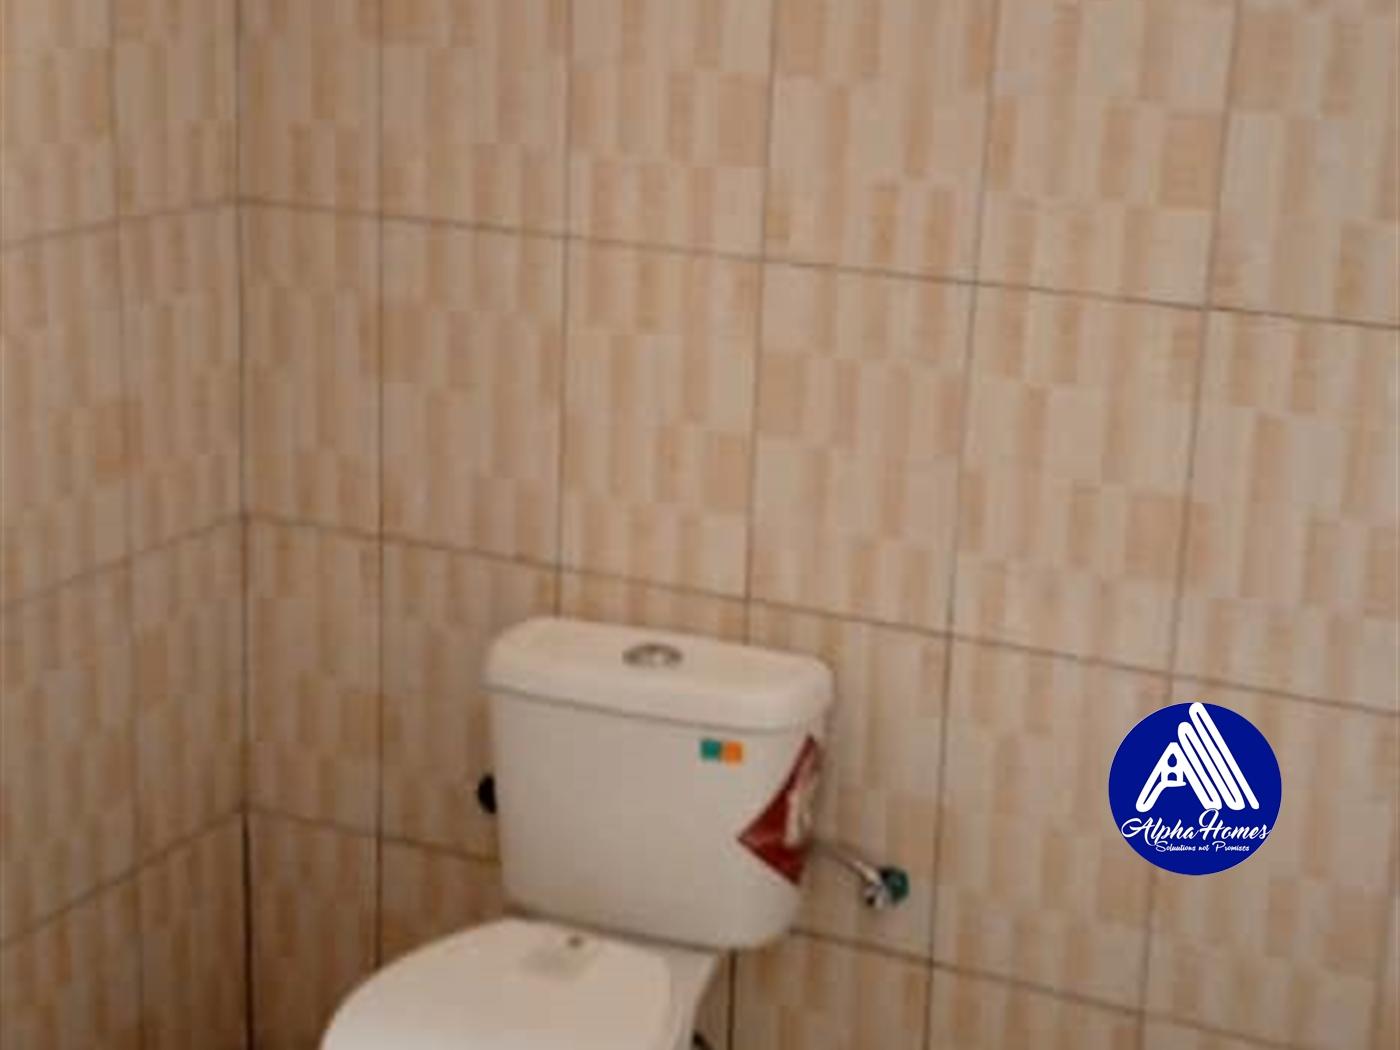 Apartment for rent in Kitetika Wakiso